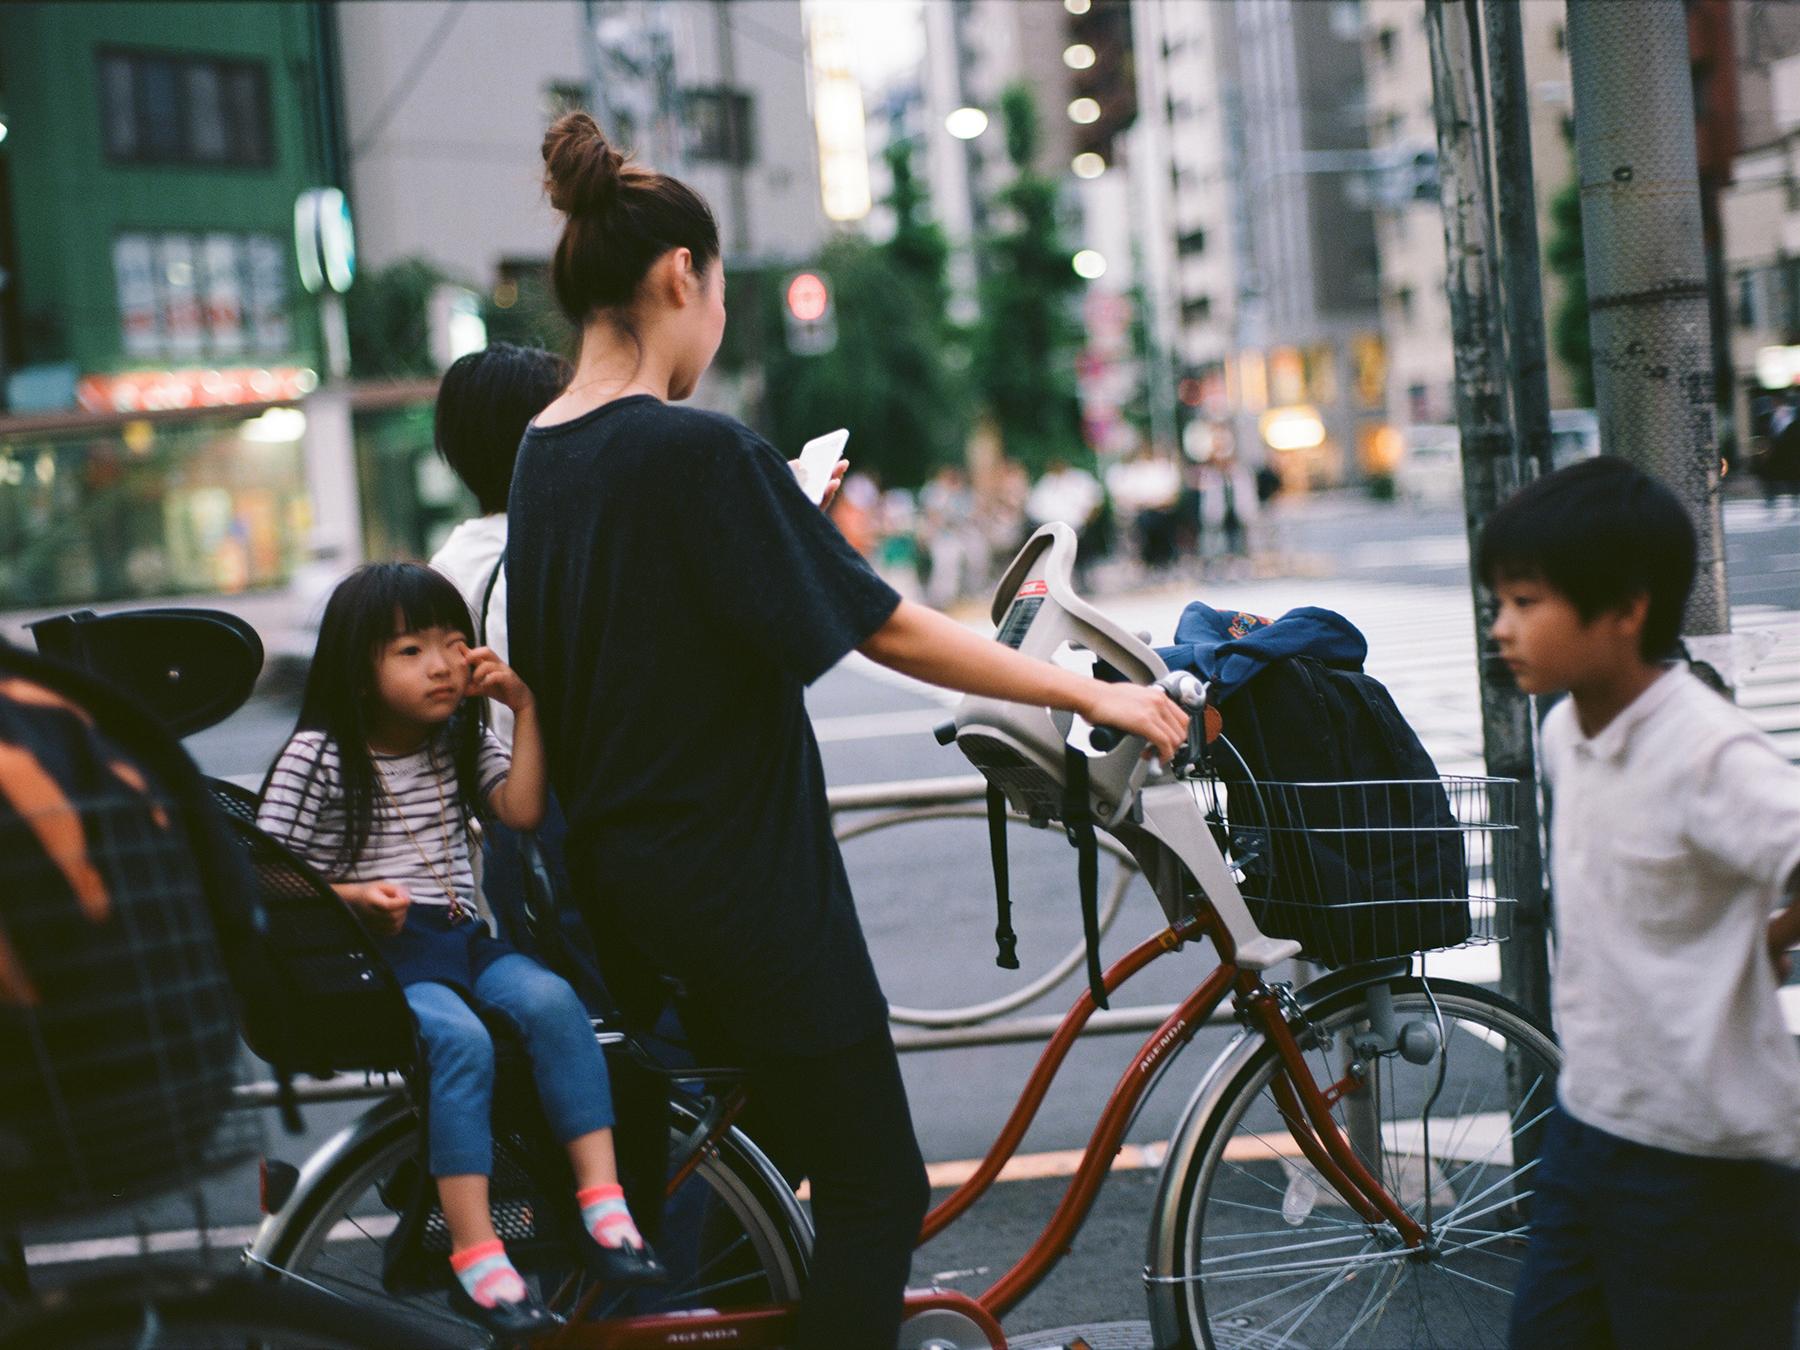 Typical Days | Mamiya 1000s | 80mm f/1.9 | Portra 400 |Alex Phommahasay